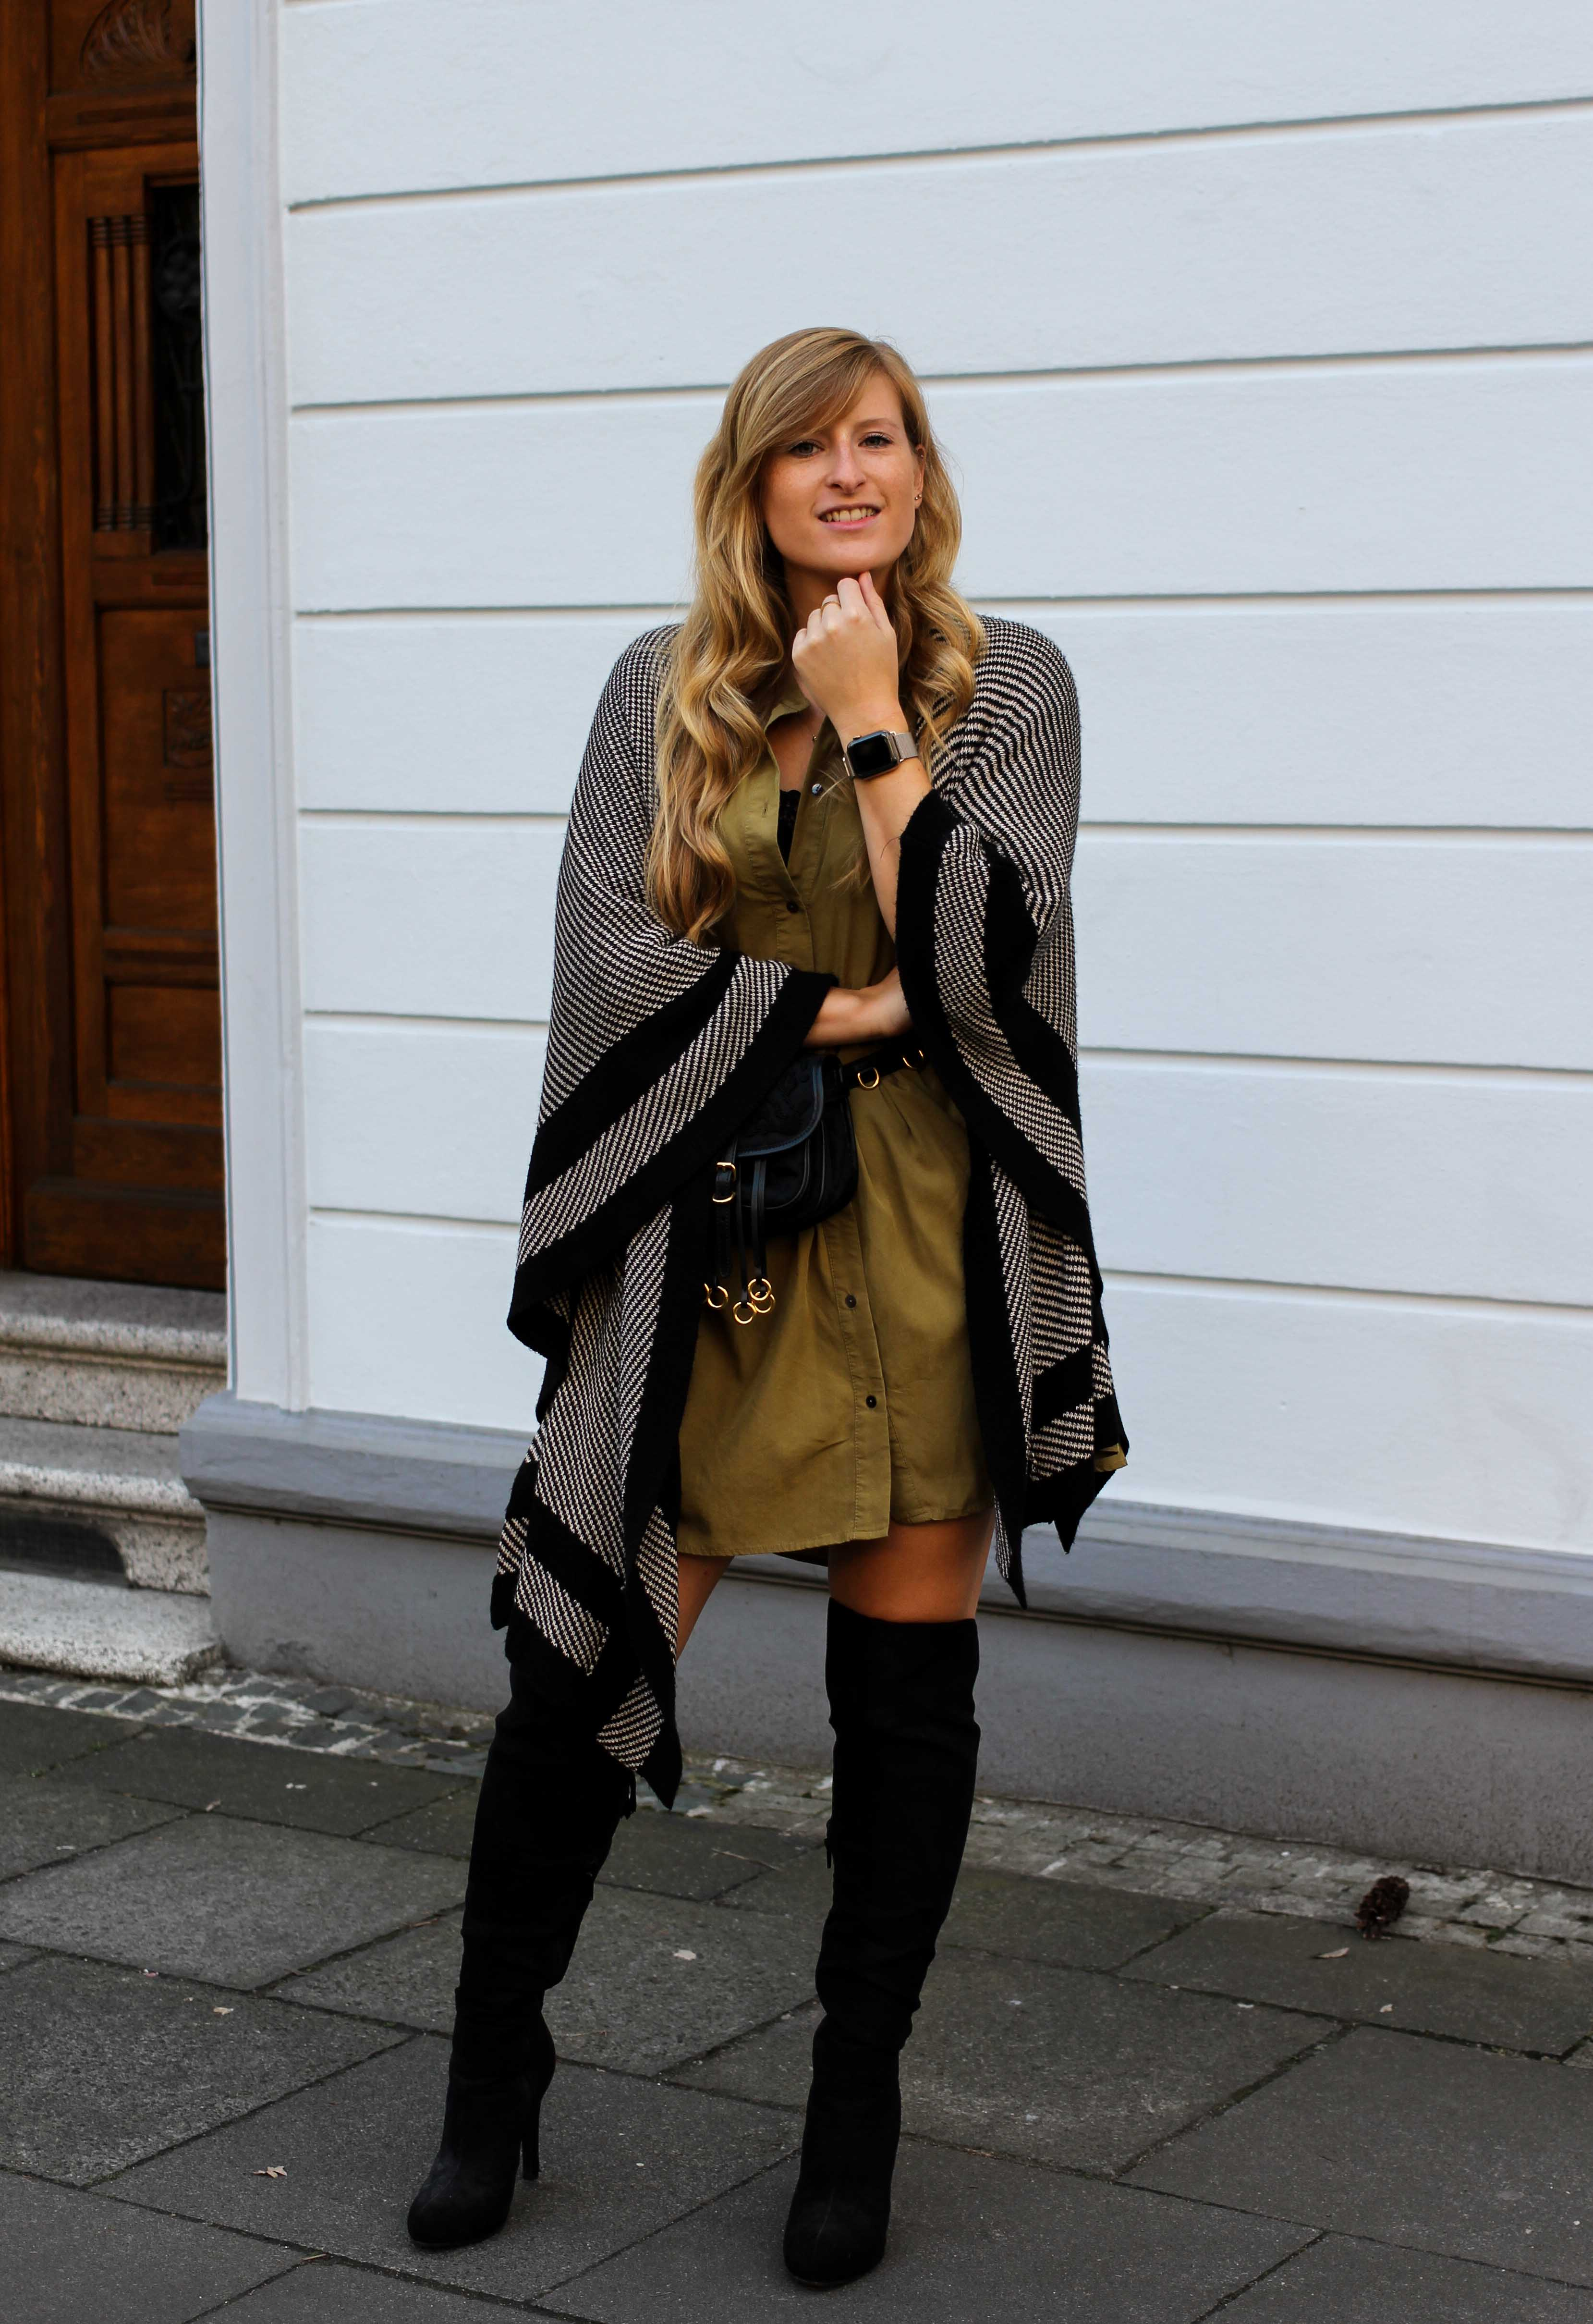 Overknees Gürteltasche Prada Poncho Second-Hand Kleidung kombinieren Streetstyle Outfit Bonn Zara Kleid grün Frühling 2019 9